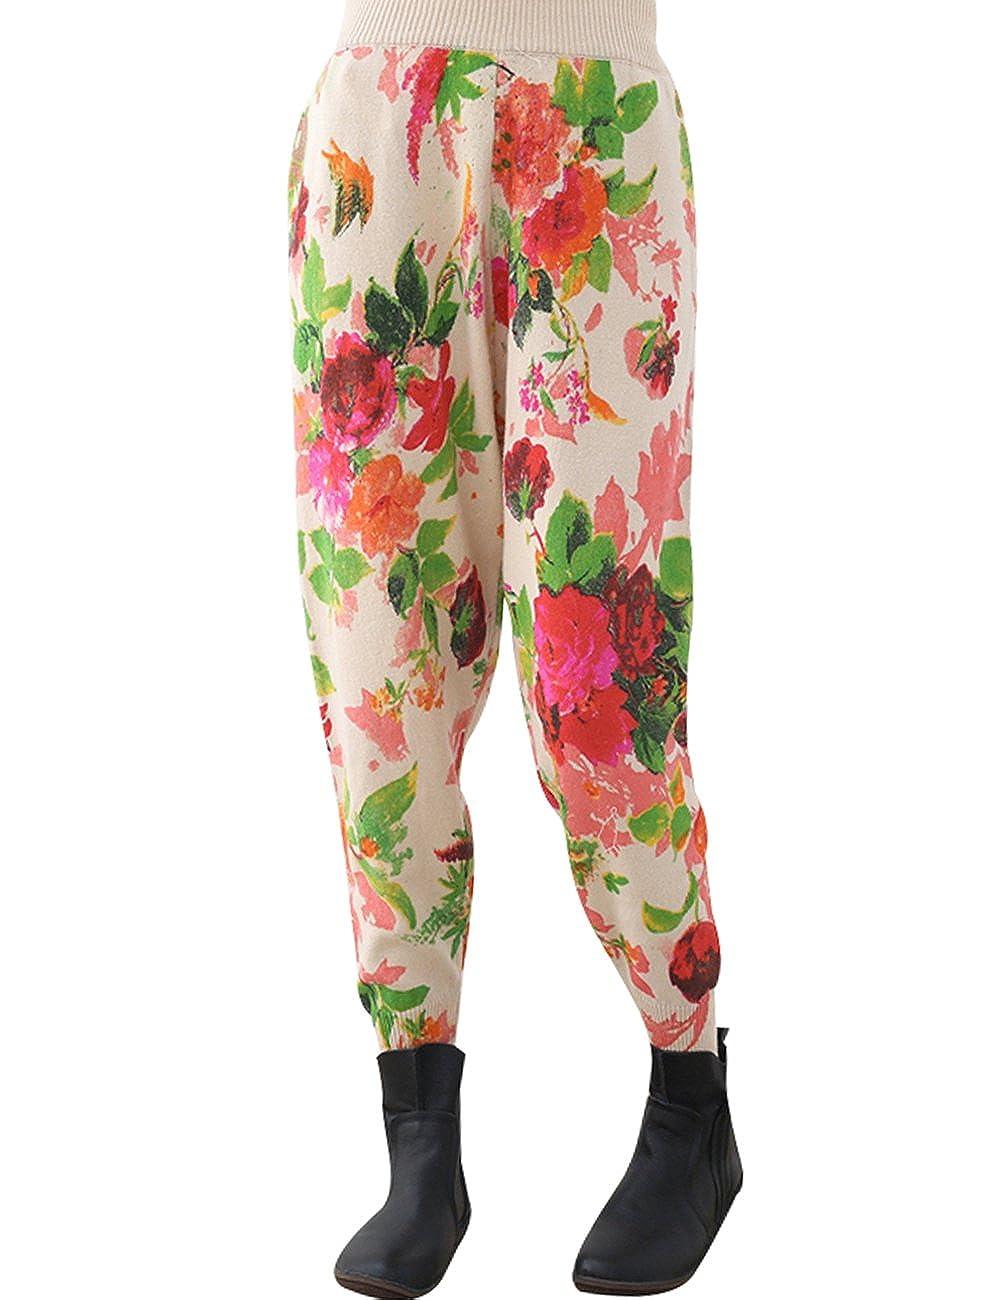 Style 3 Zoulee Women's Elastic Waist Printed Wool Pants Harem Pants